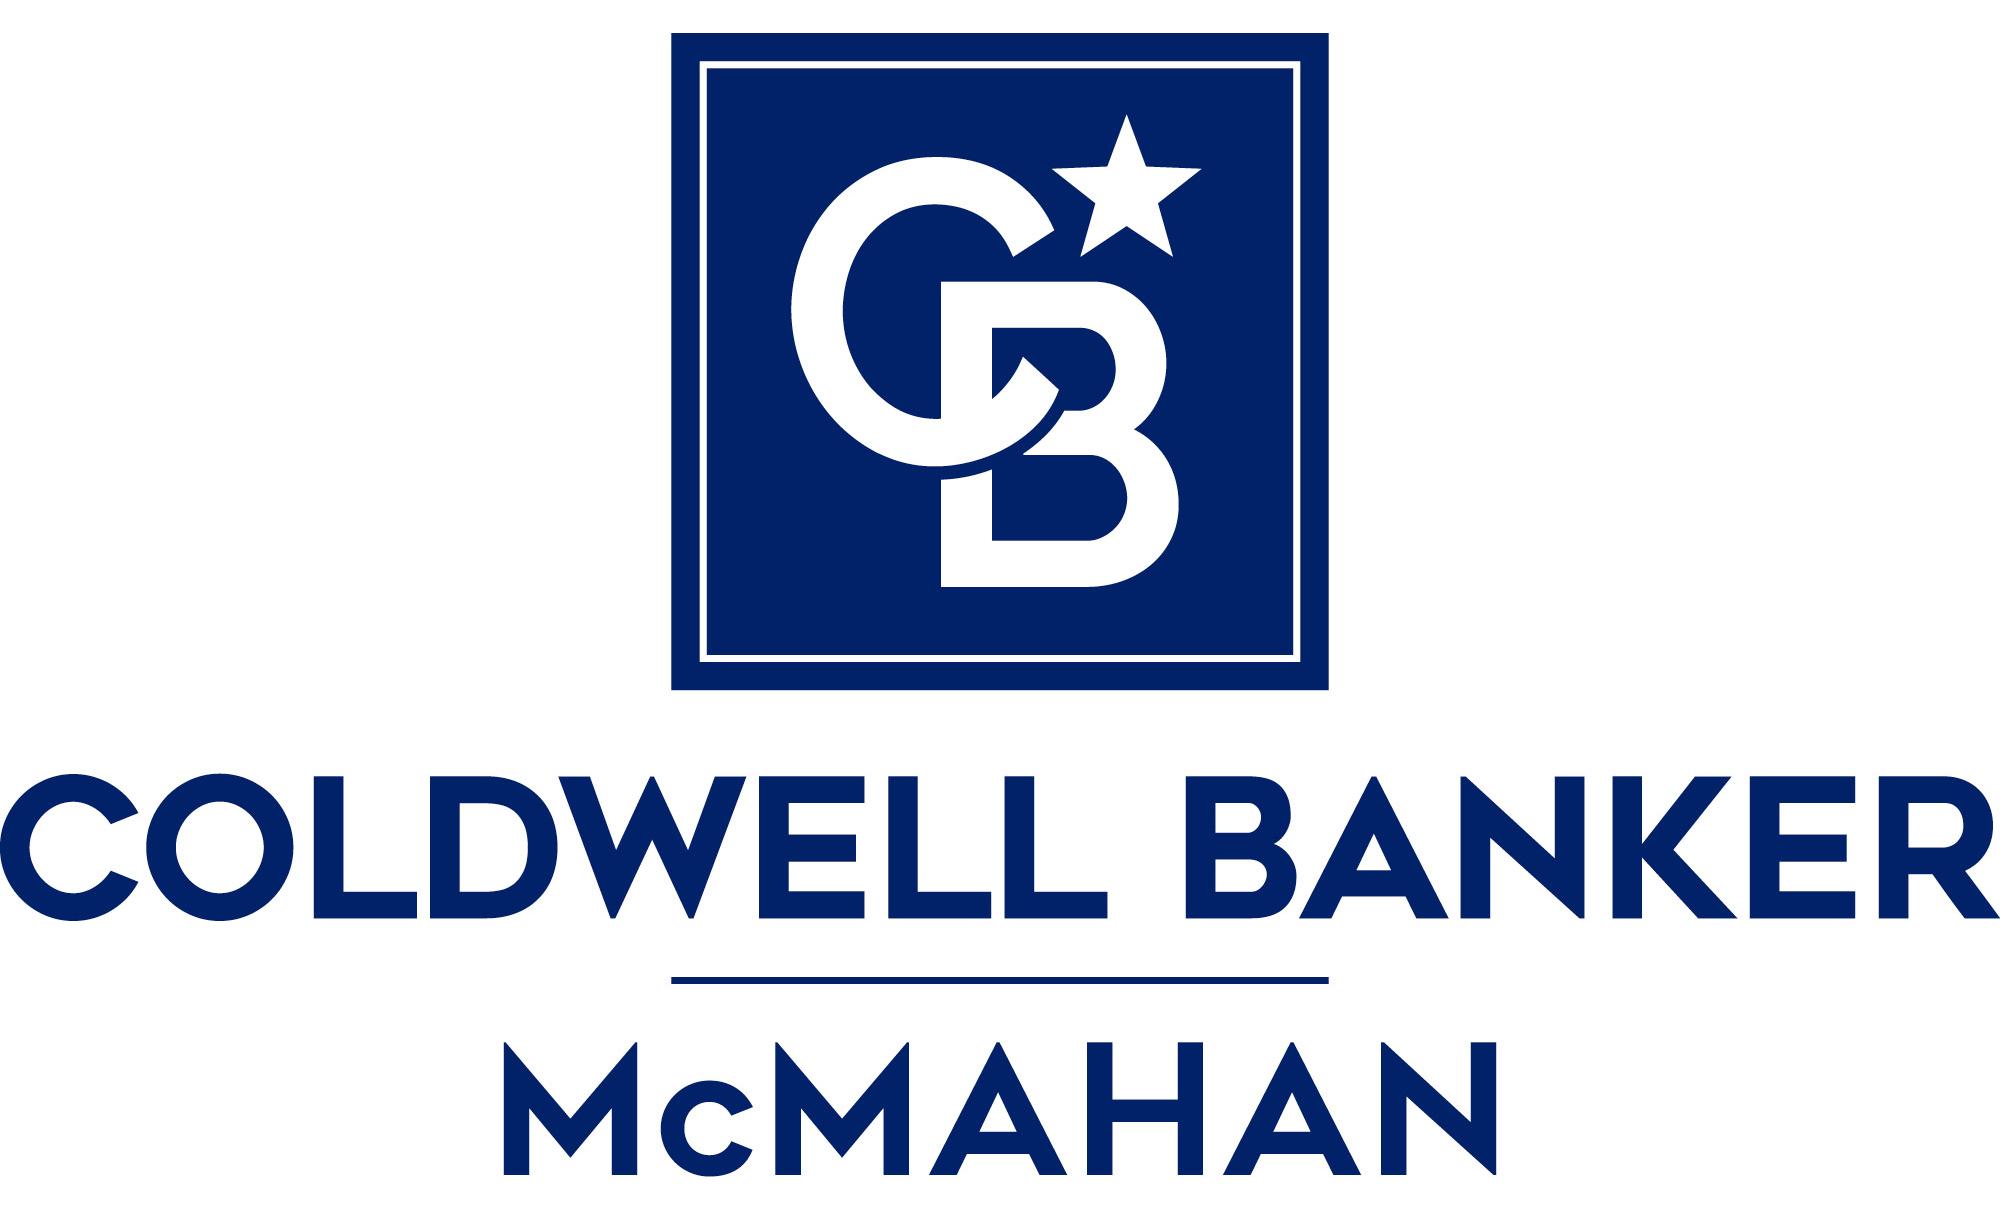 Jesse Upchurch - Coldwell Banker McMahan Logo